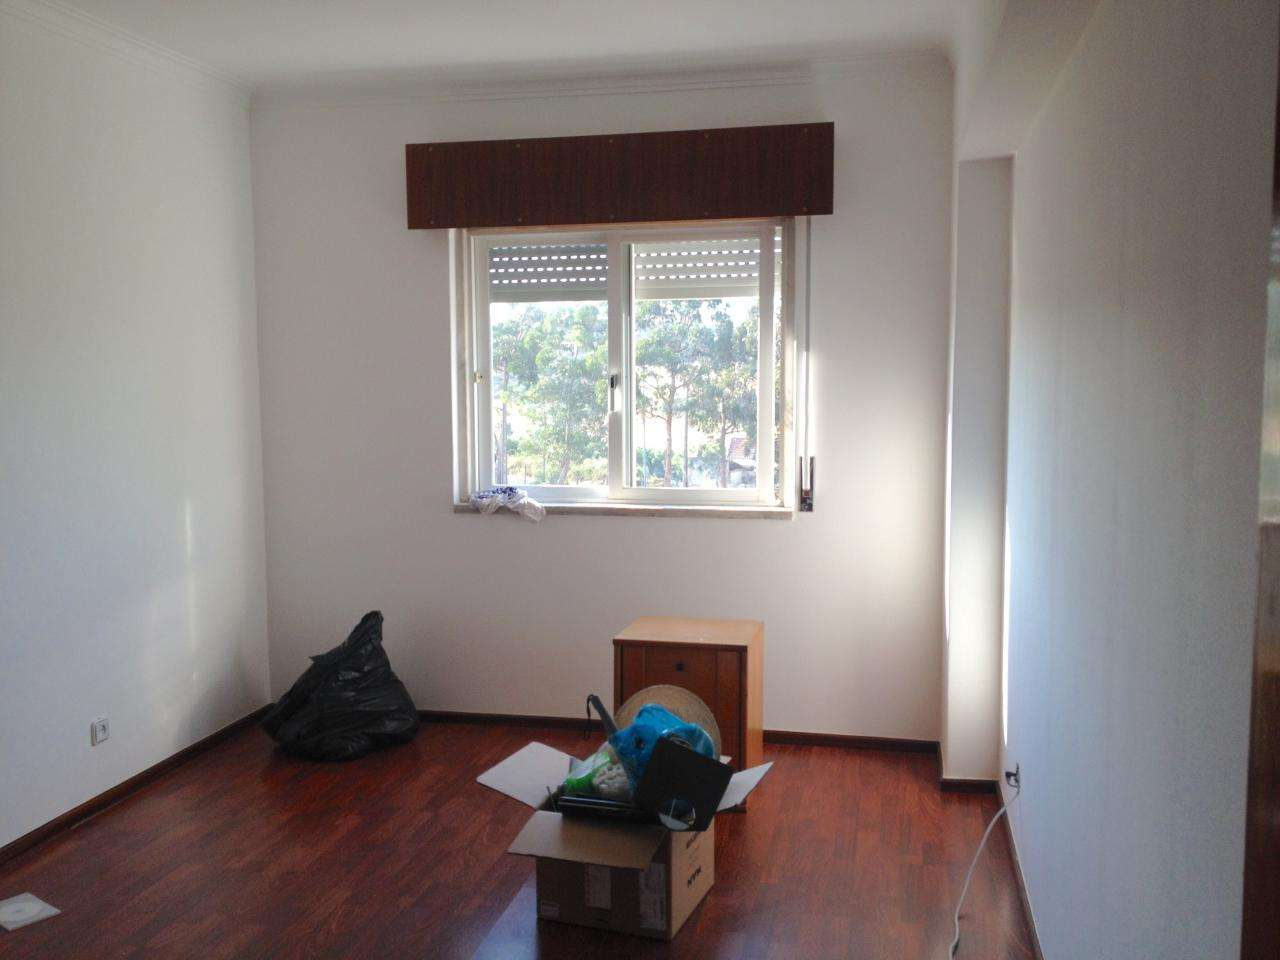 Apartamento para comprar, Rio de Mouro, Lisboa - Foto 27